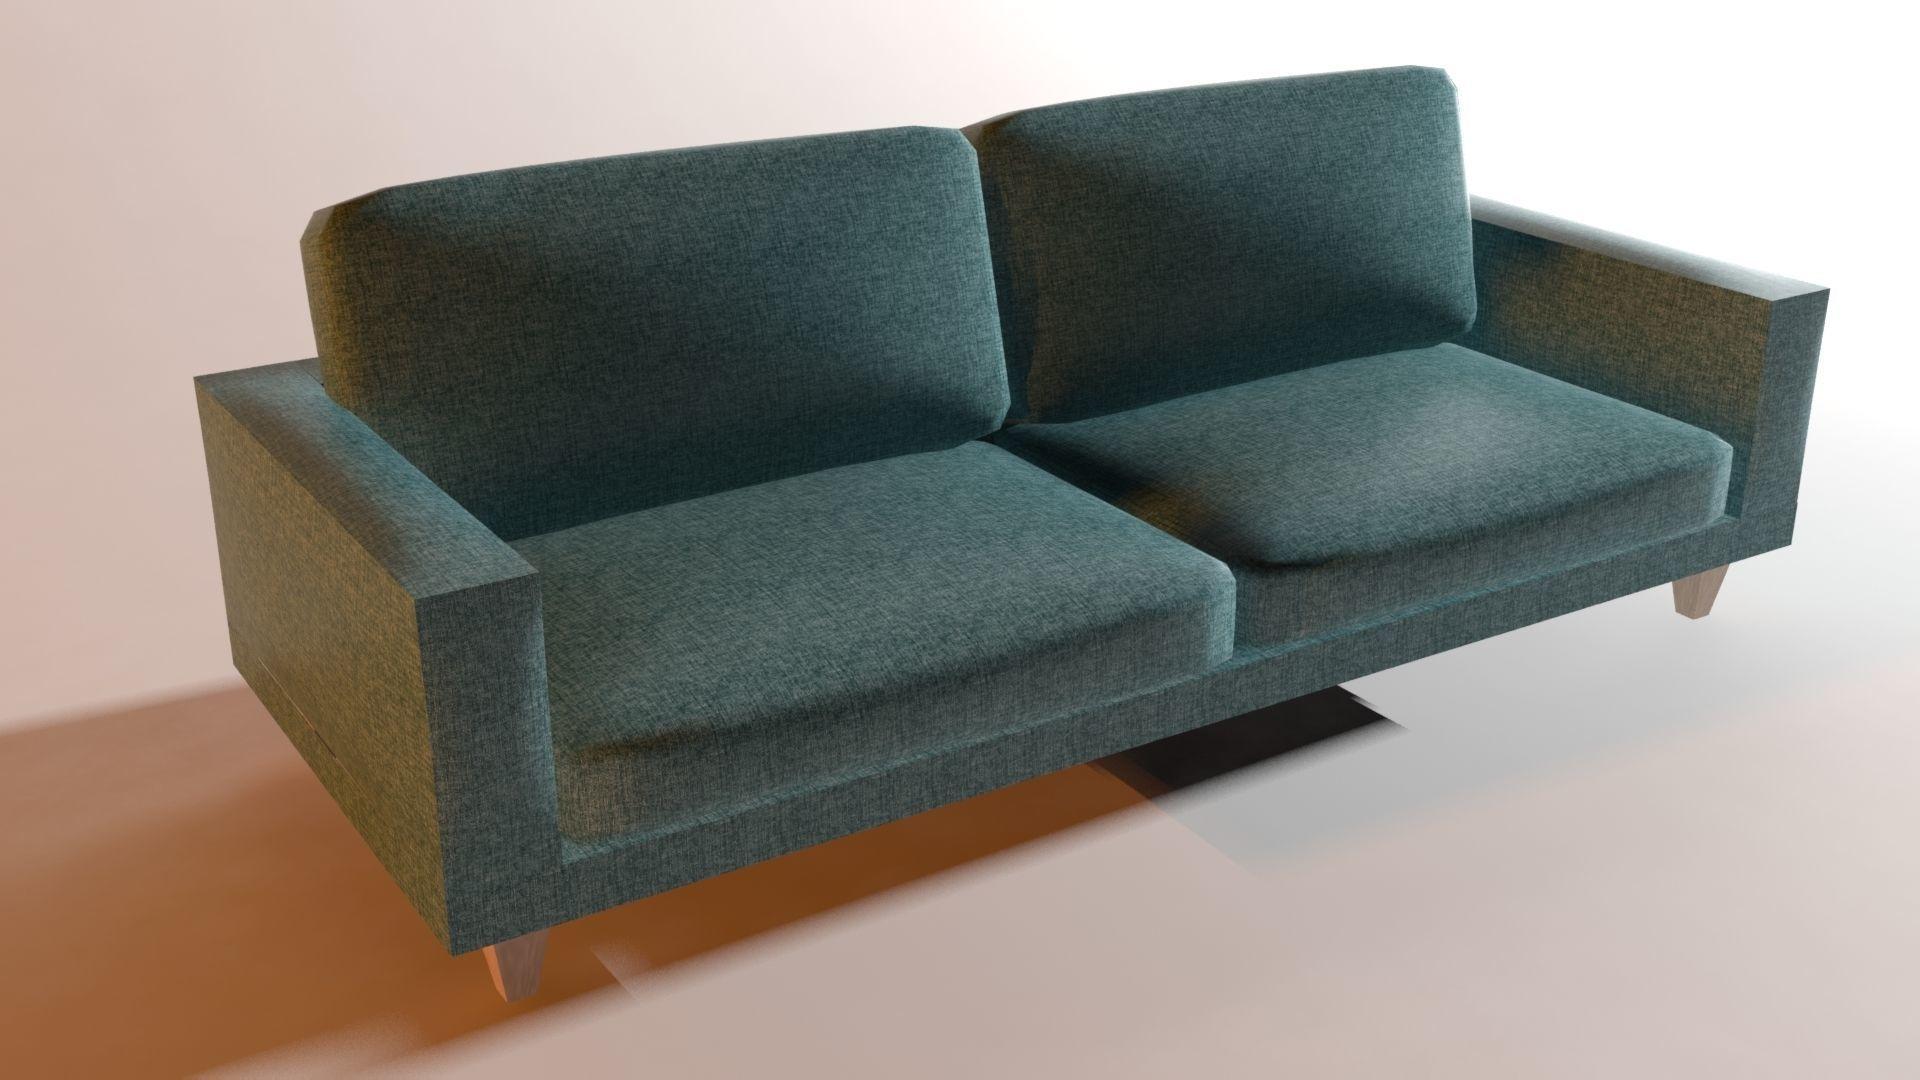 Sofa LowPoly